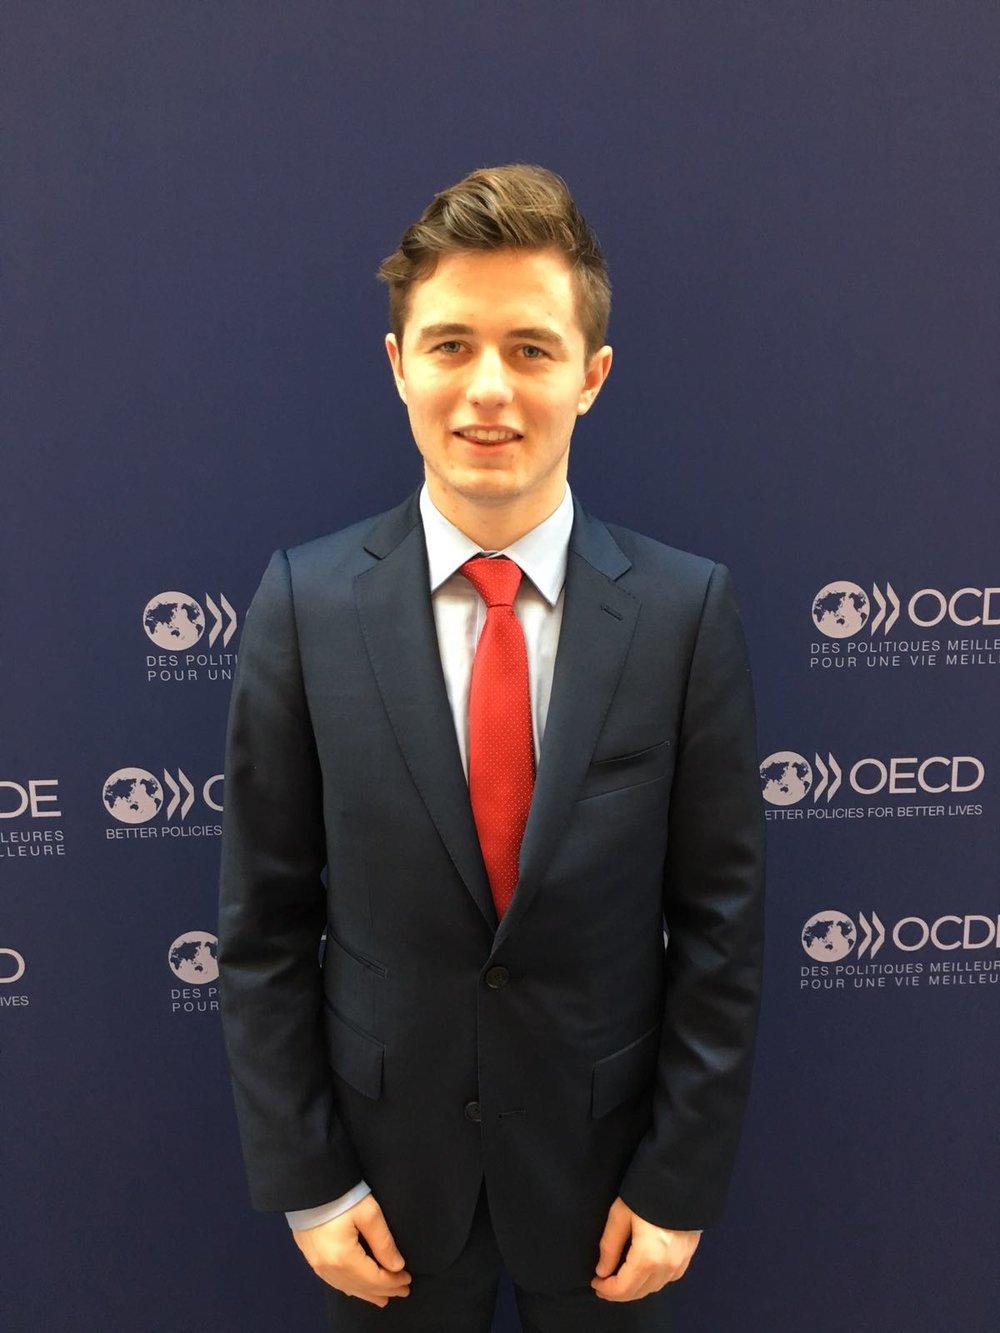 Jack Dalrymple OECD Headshot No. 2 copy.jpeg